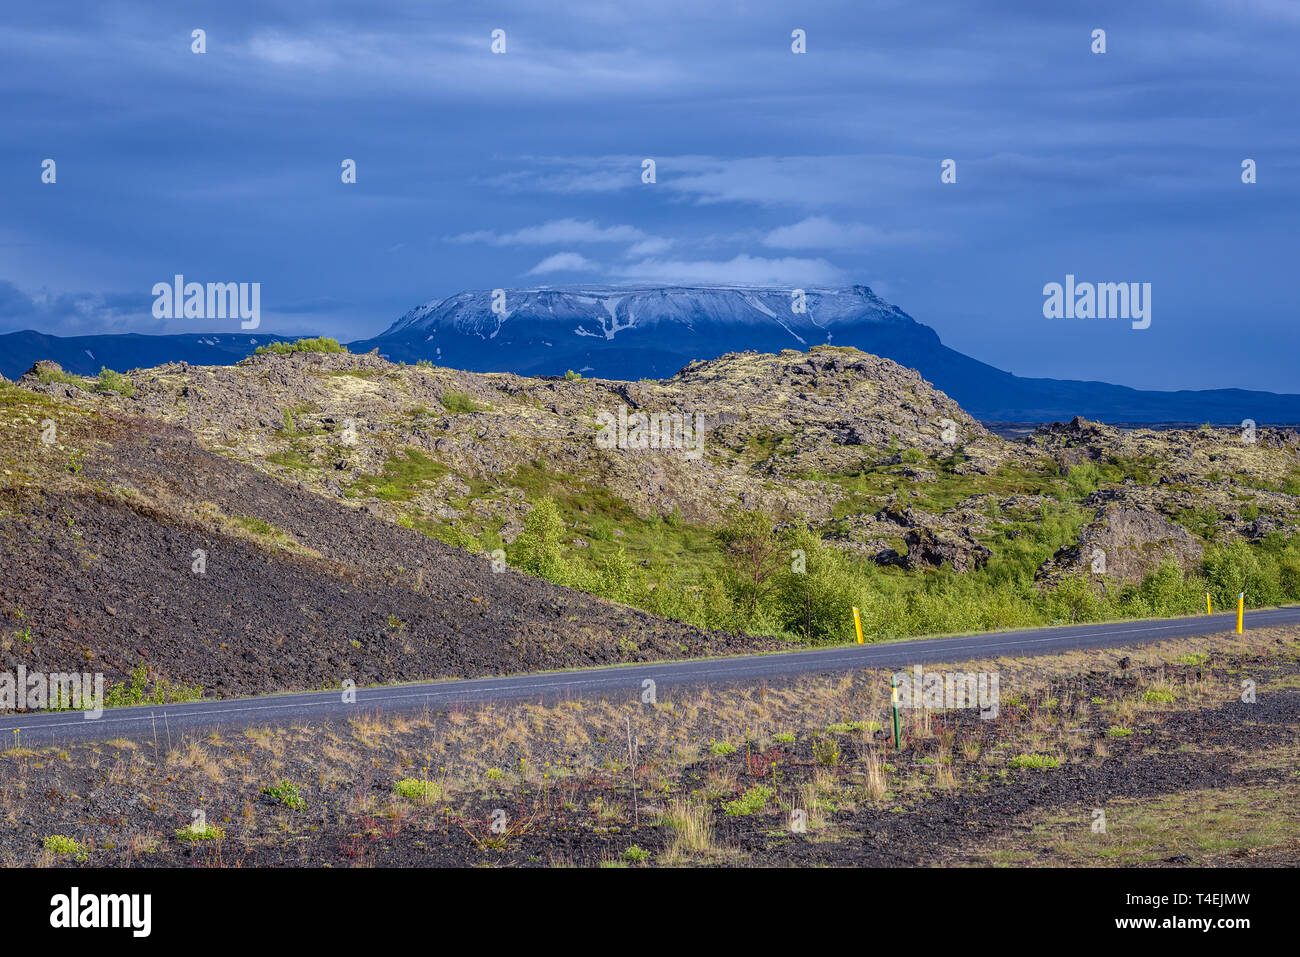 Road 848 along Lake Myvatn near Reykjahlid village in Iceland, Blafjall mountain on background - Stock Image